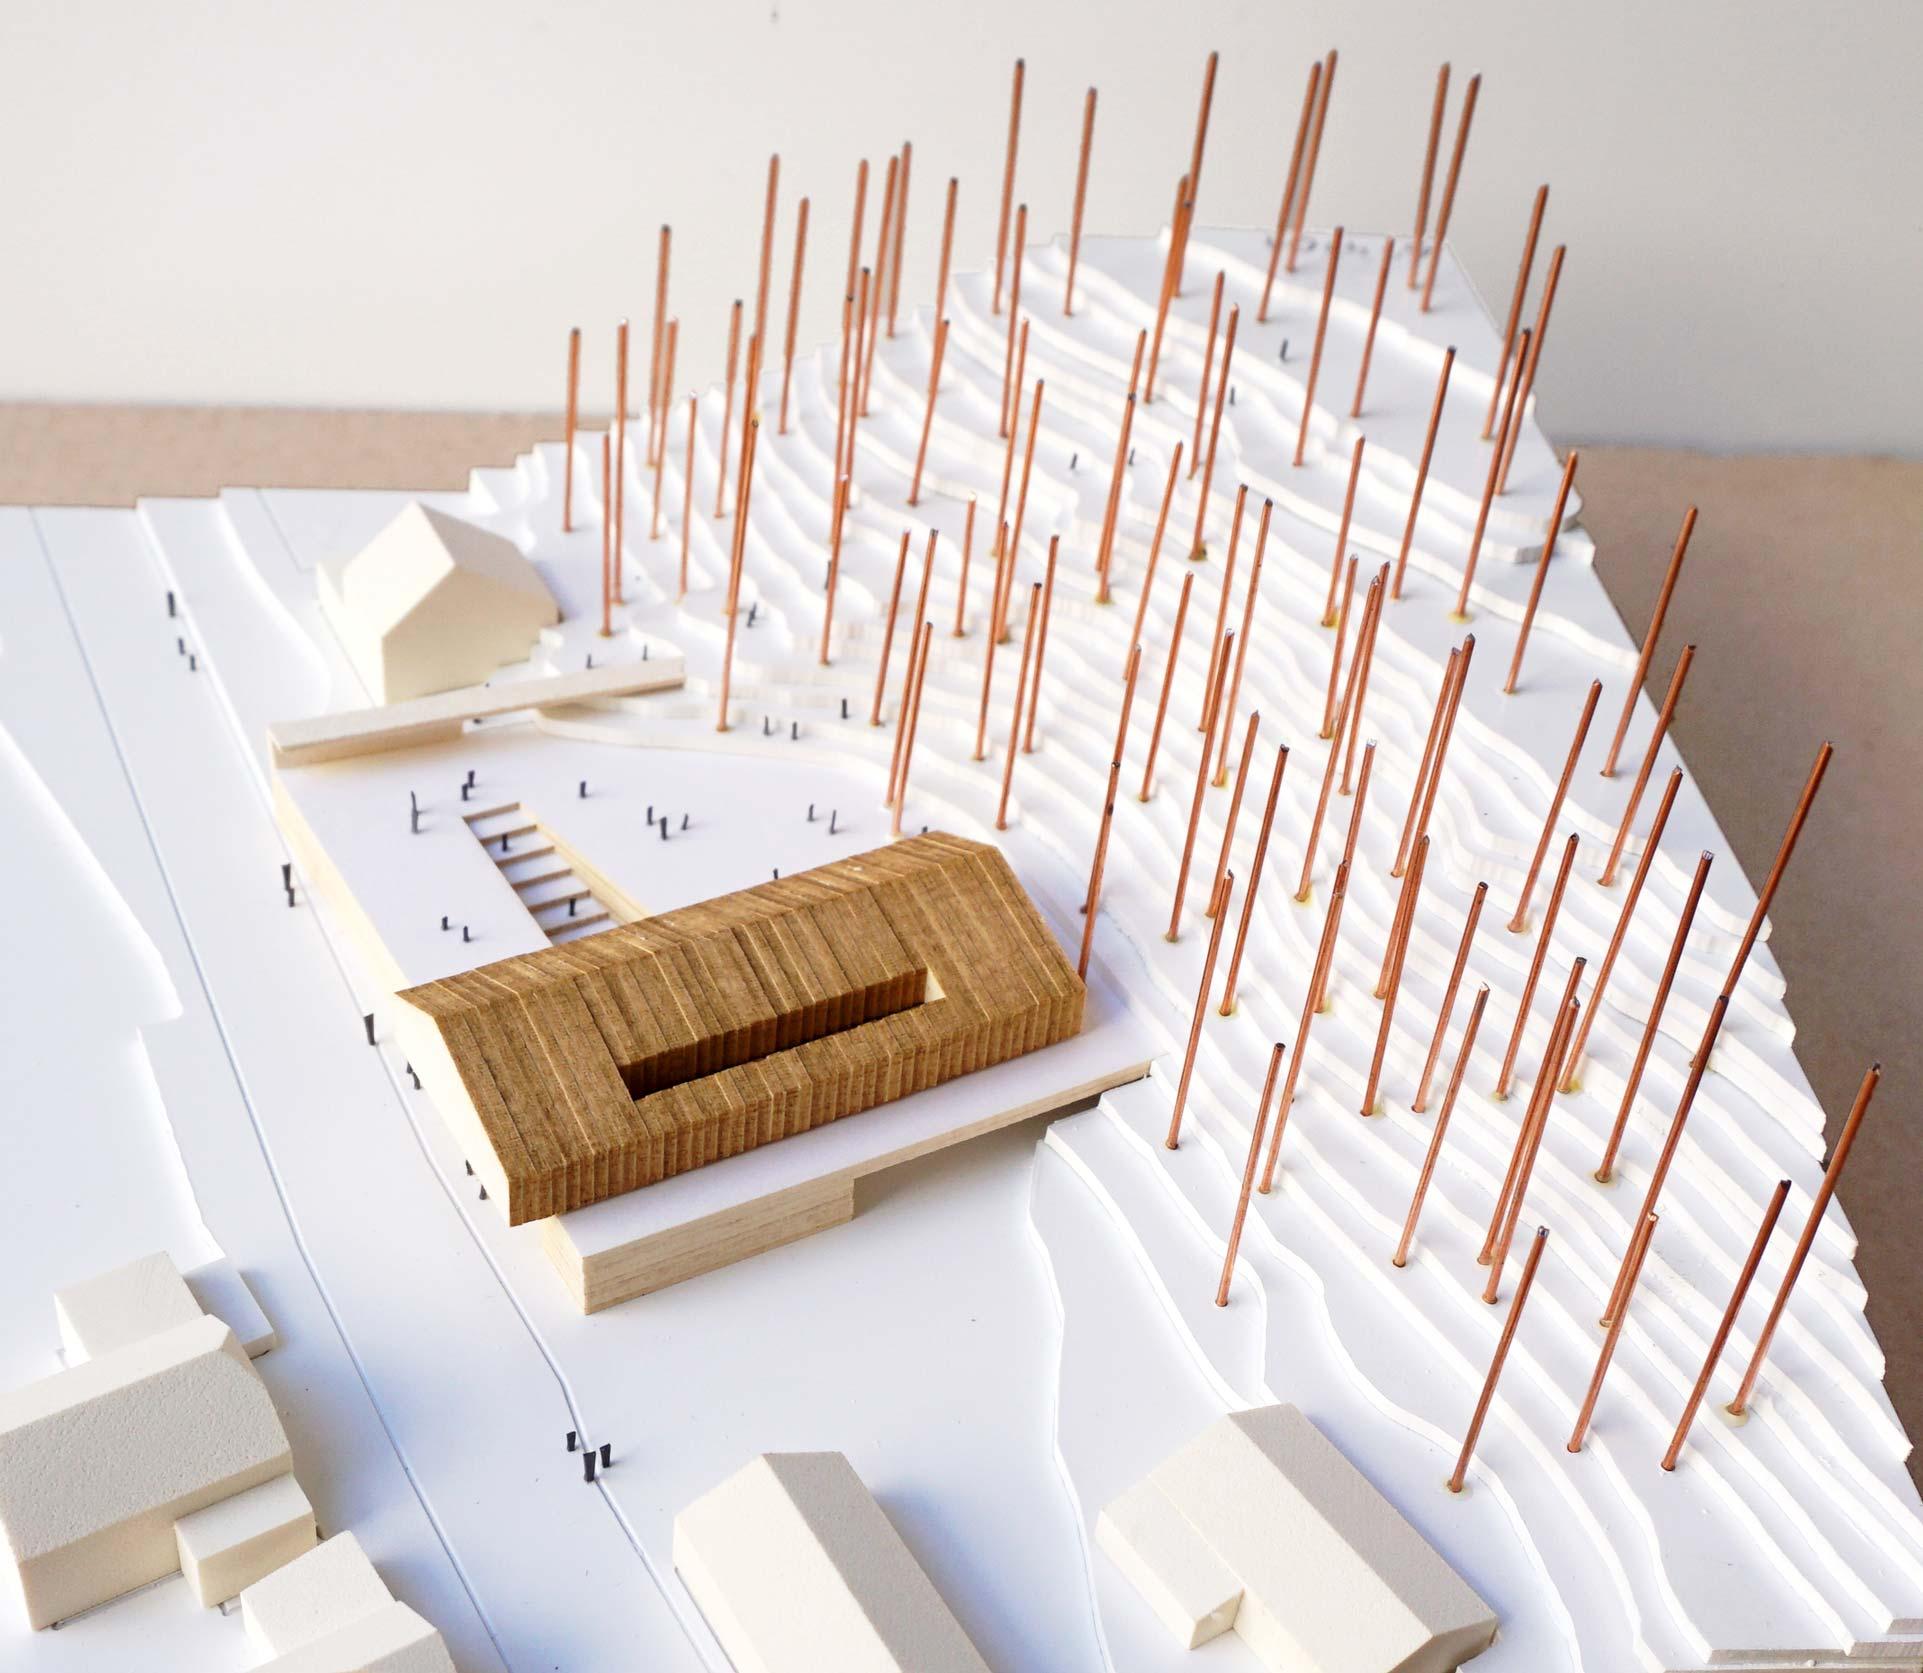 STUDIOKUBIK-architektur-architecture-berlin-kindergarten-marktoberdorf_4